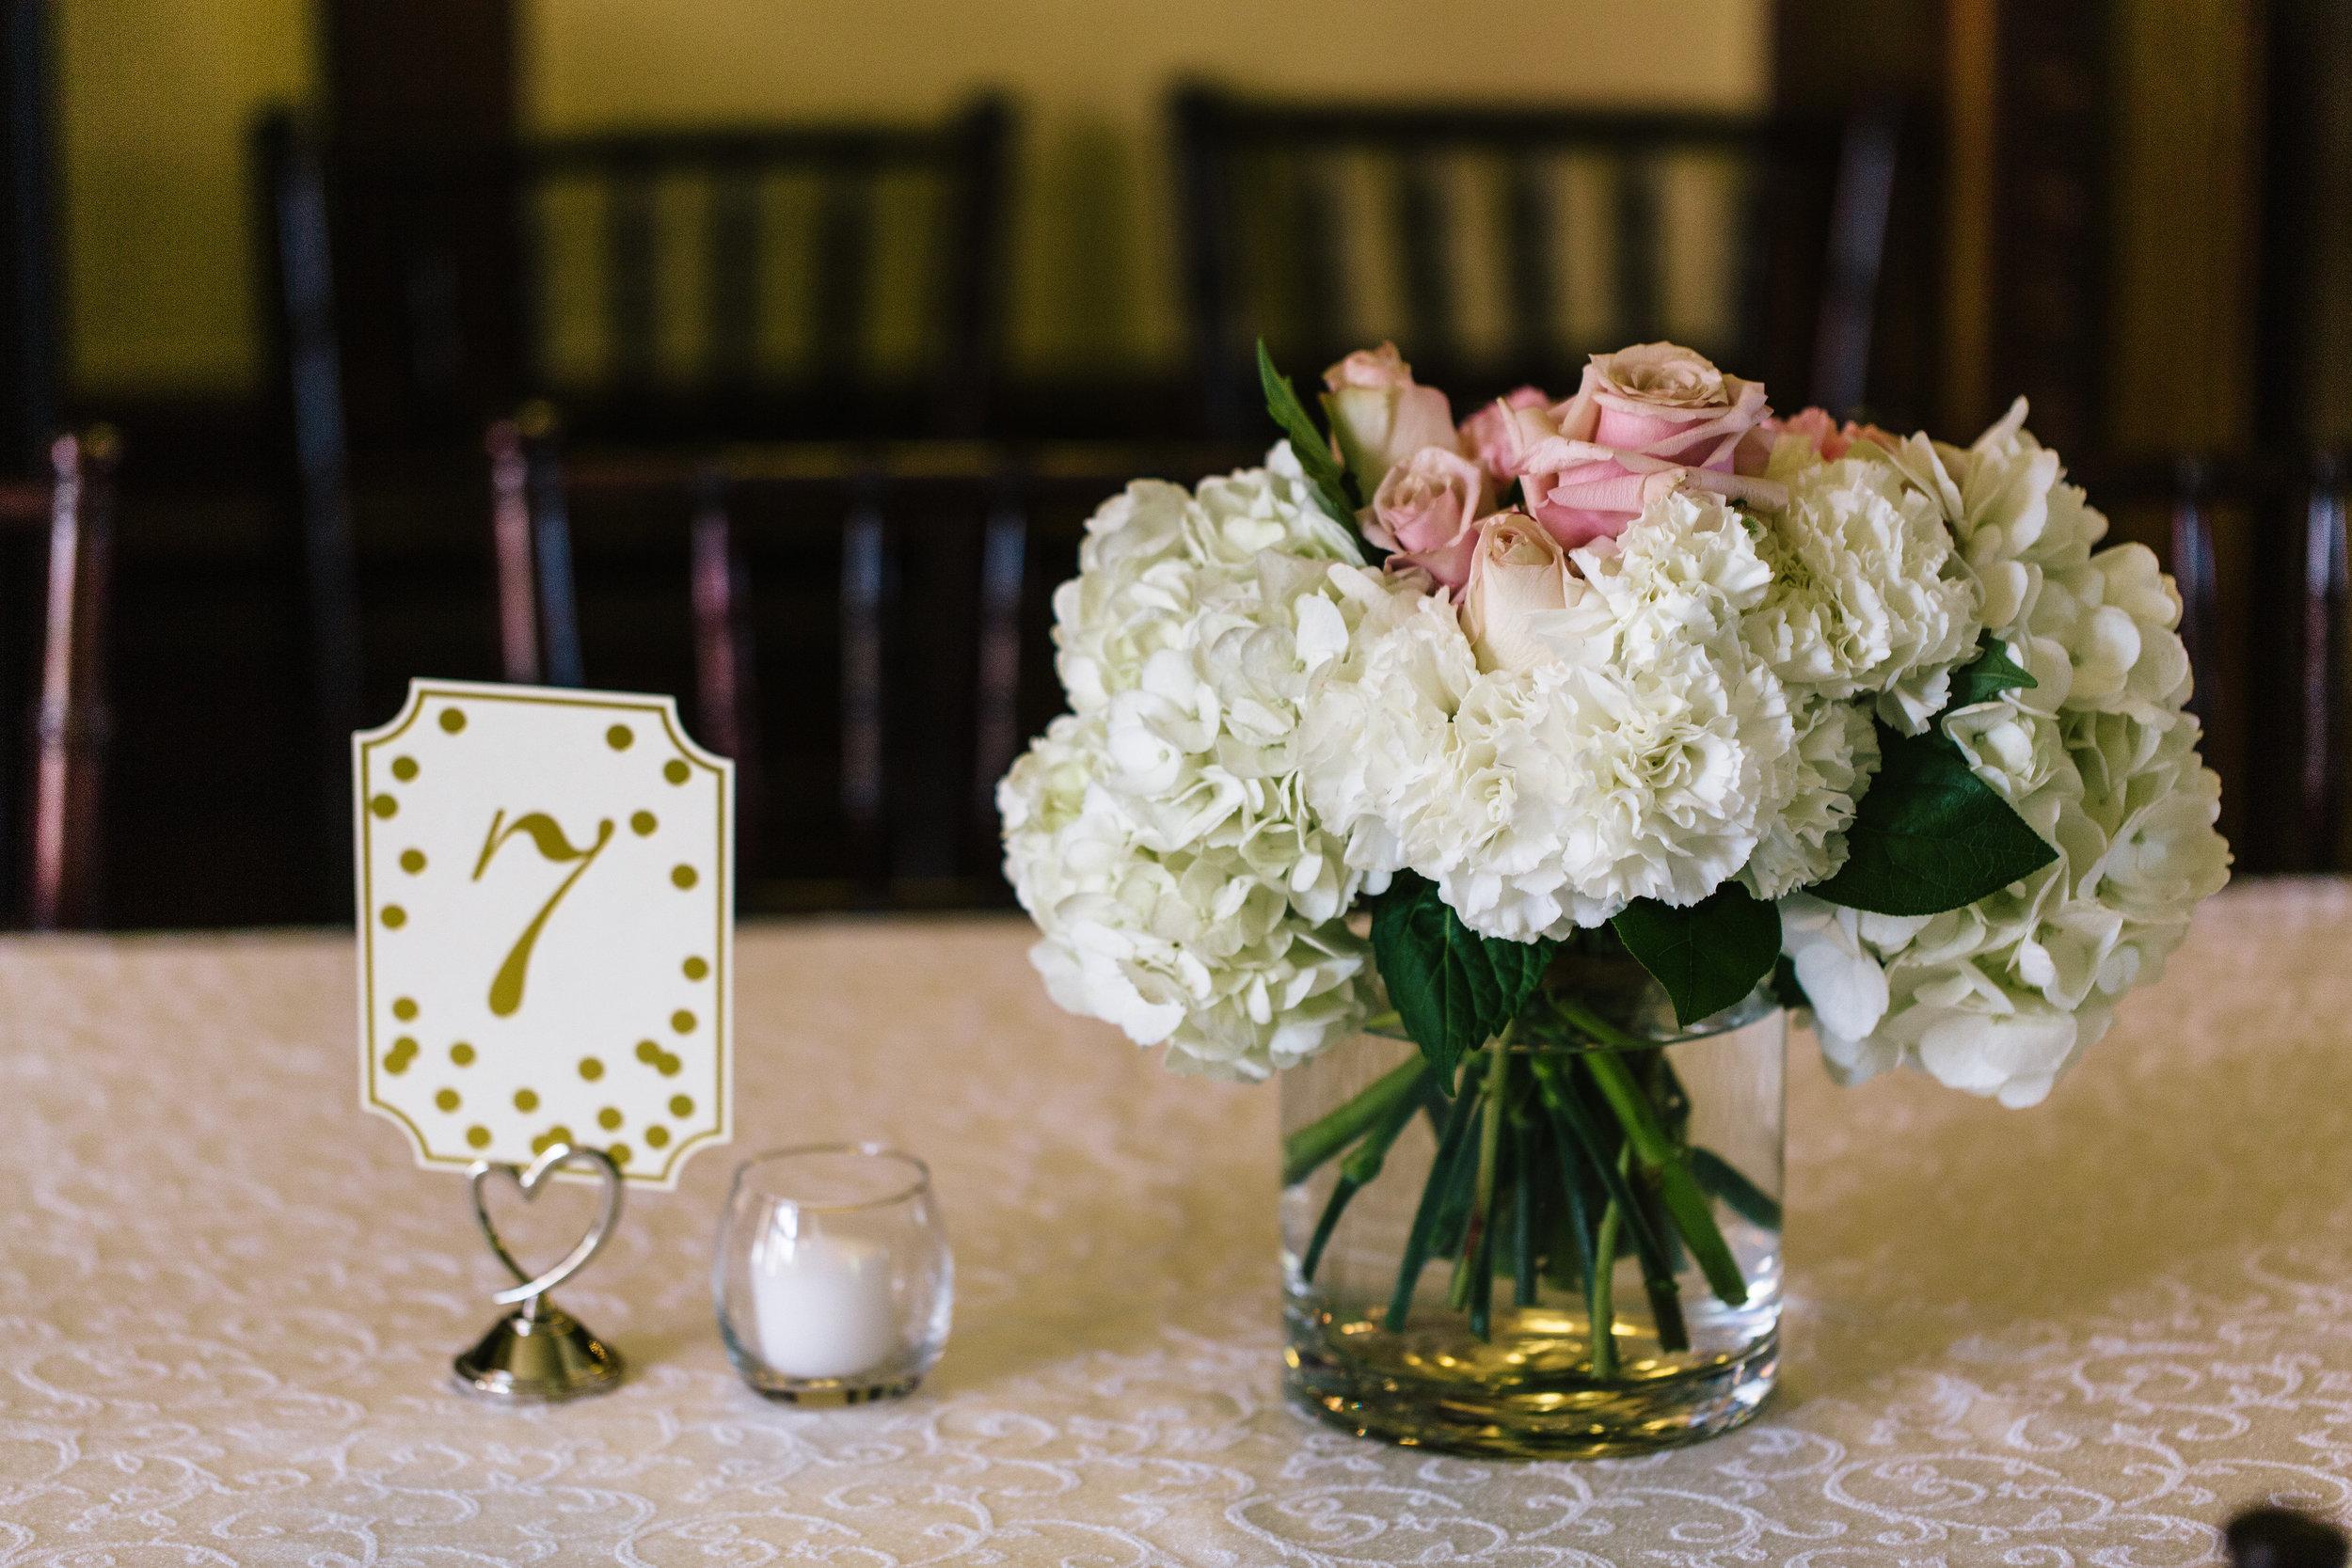 kellylemonphotography_lucy+kento_wedding-189.jpg